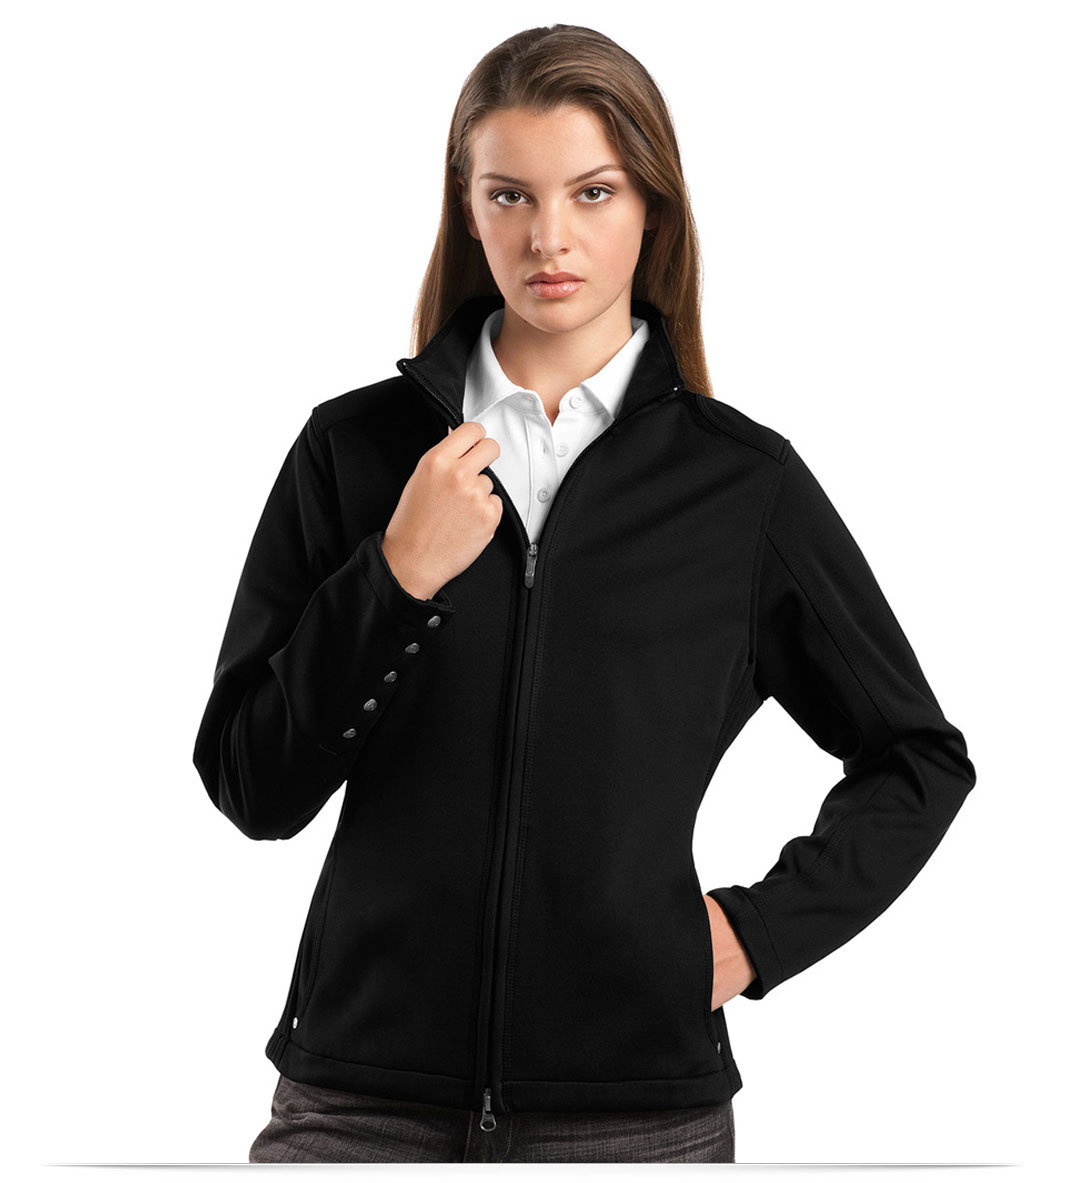 Personalized Ladies Bombshell Jacket